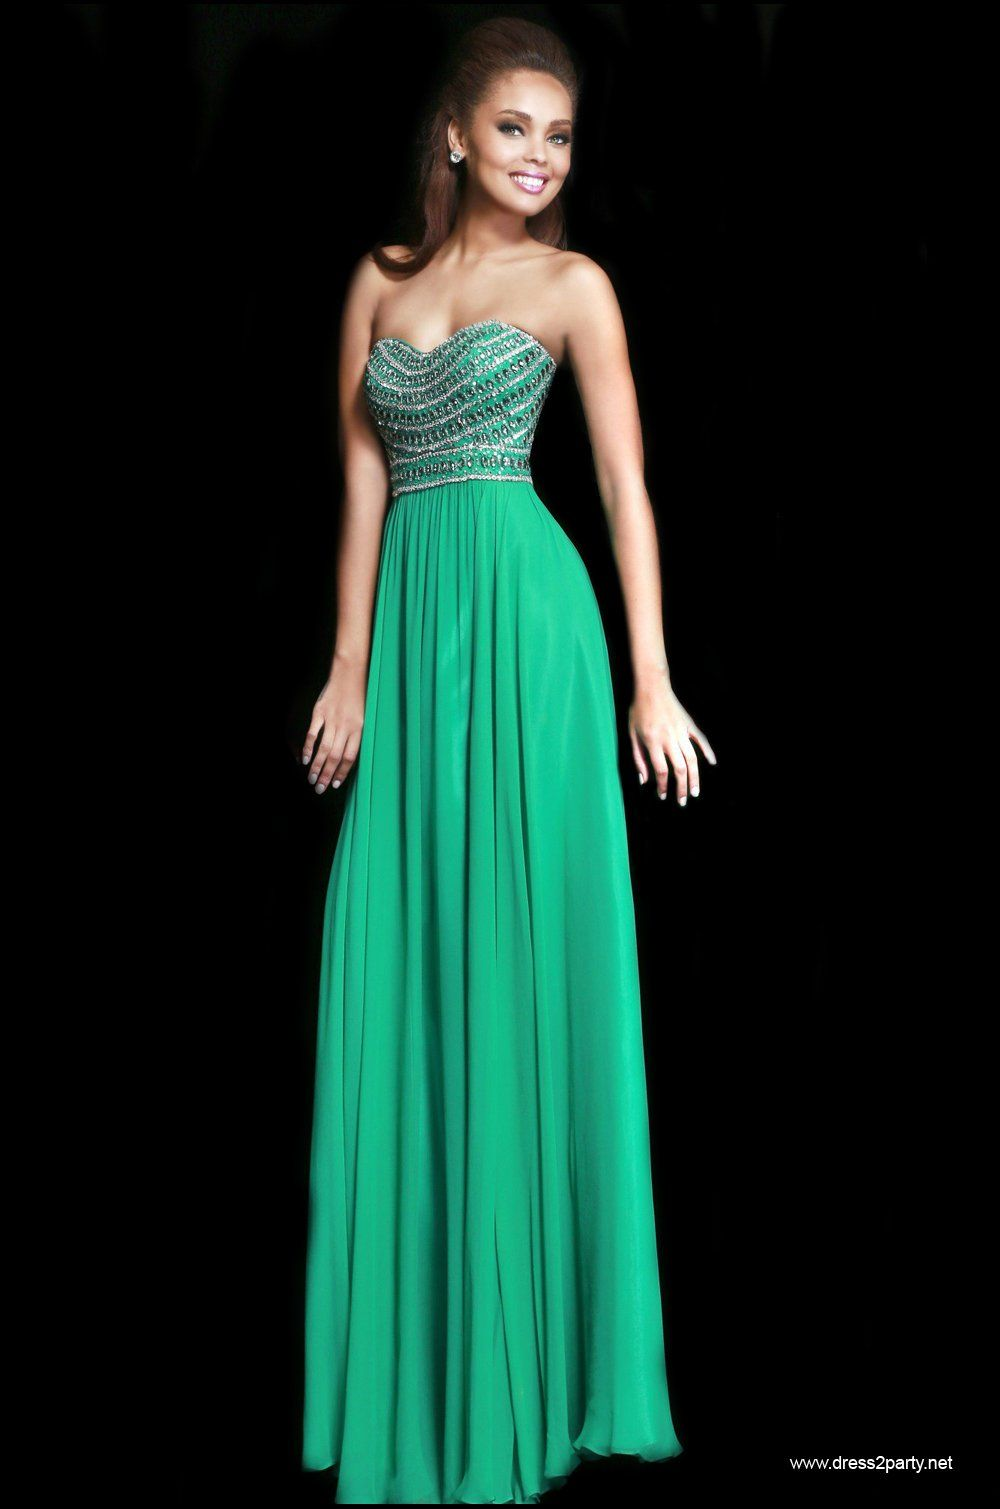 Luck of the Irish in a beautiful emerald green full length dress ...